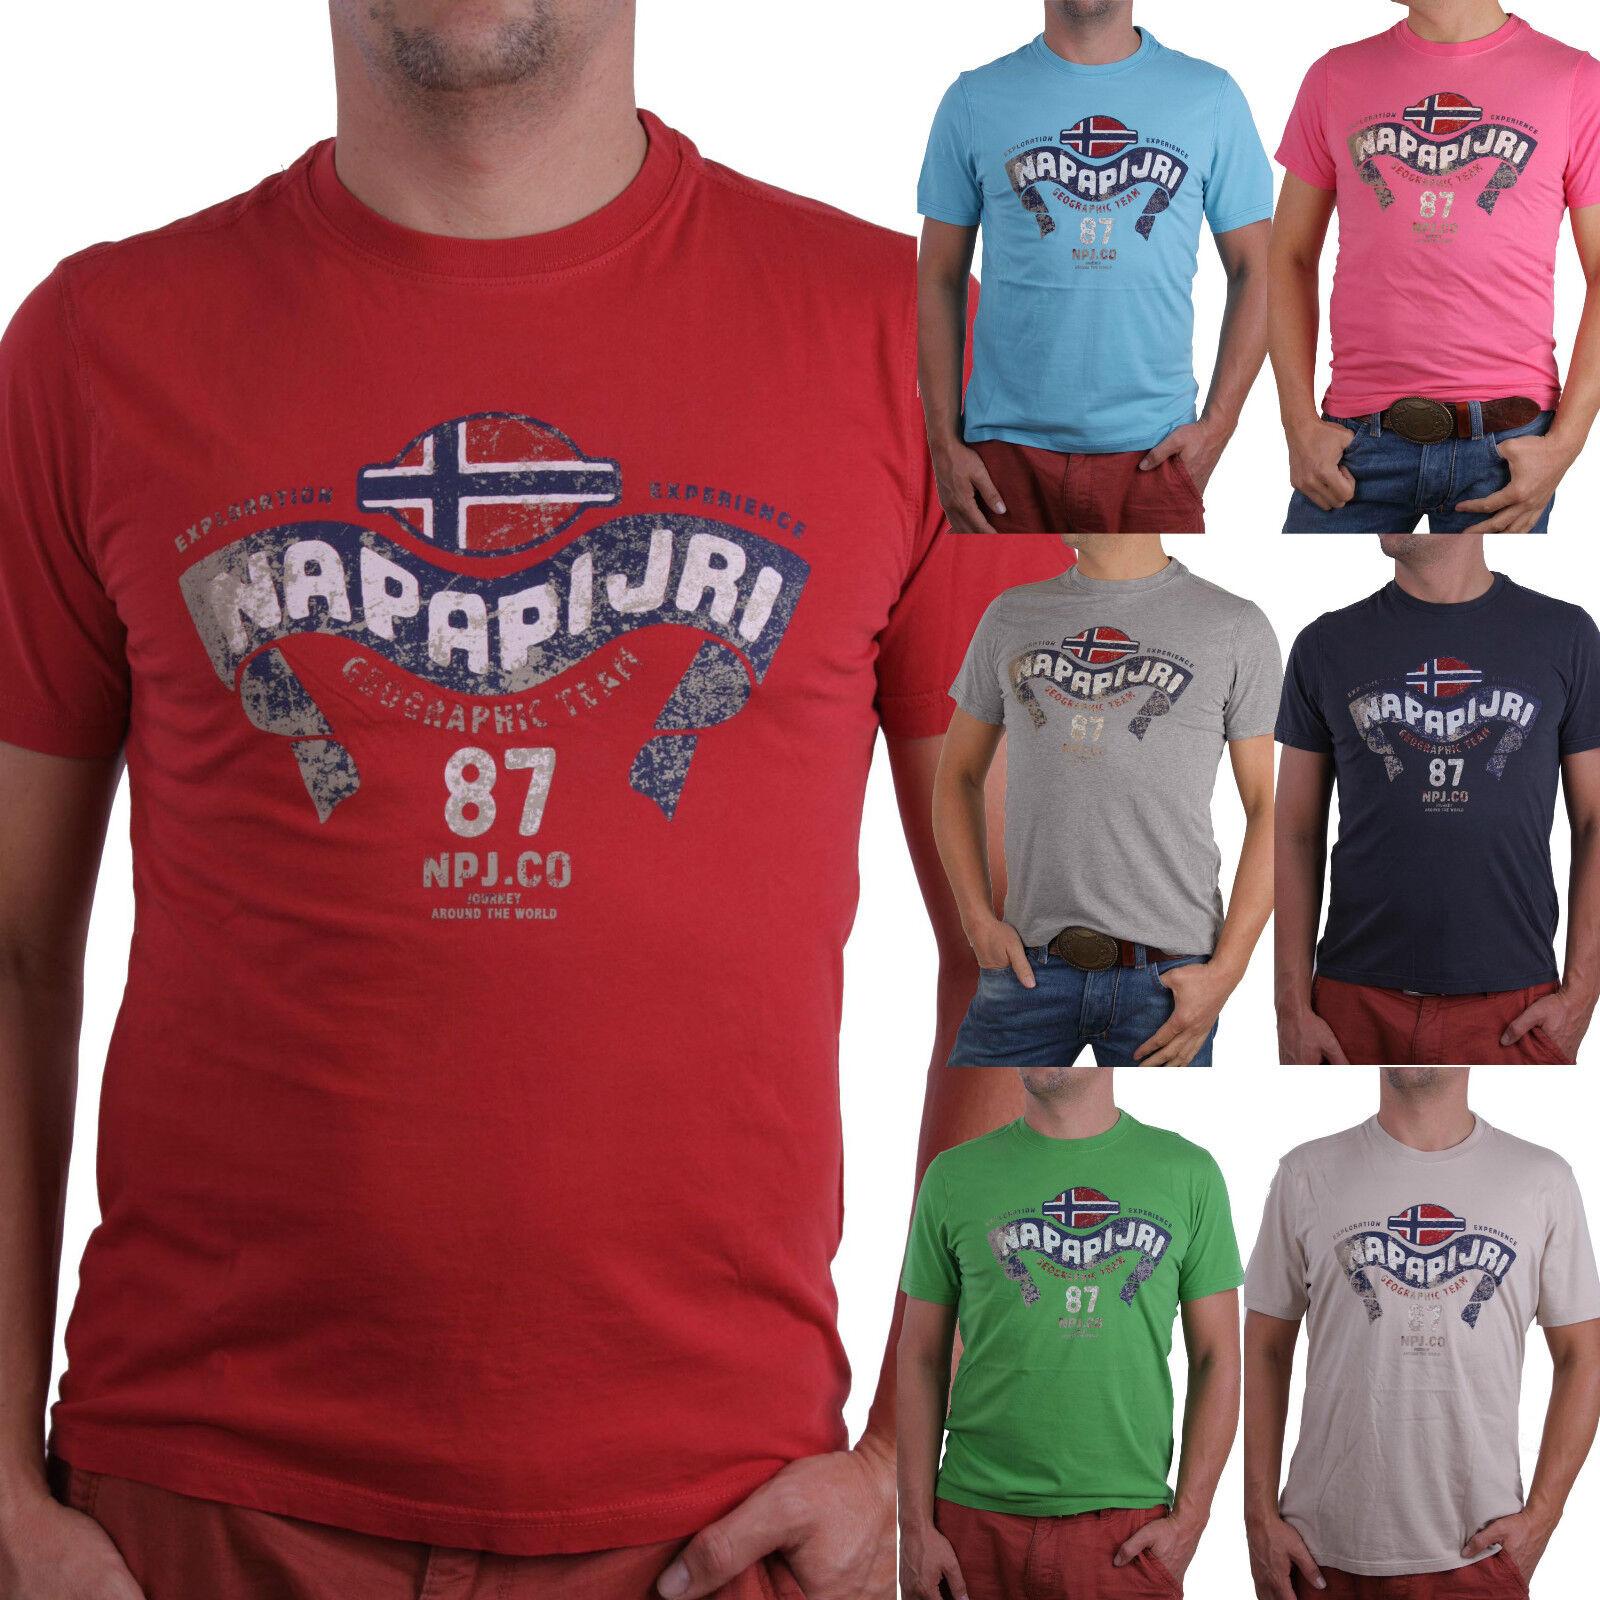 dd31f534 Napapijri T-Shirt Shirt Kurzarm Shinab Viele Farben und Größen ...